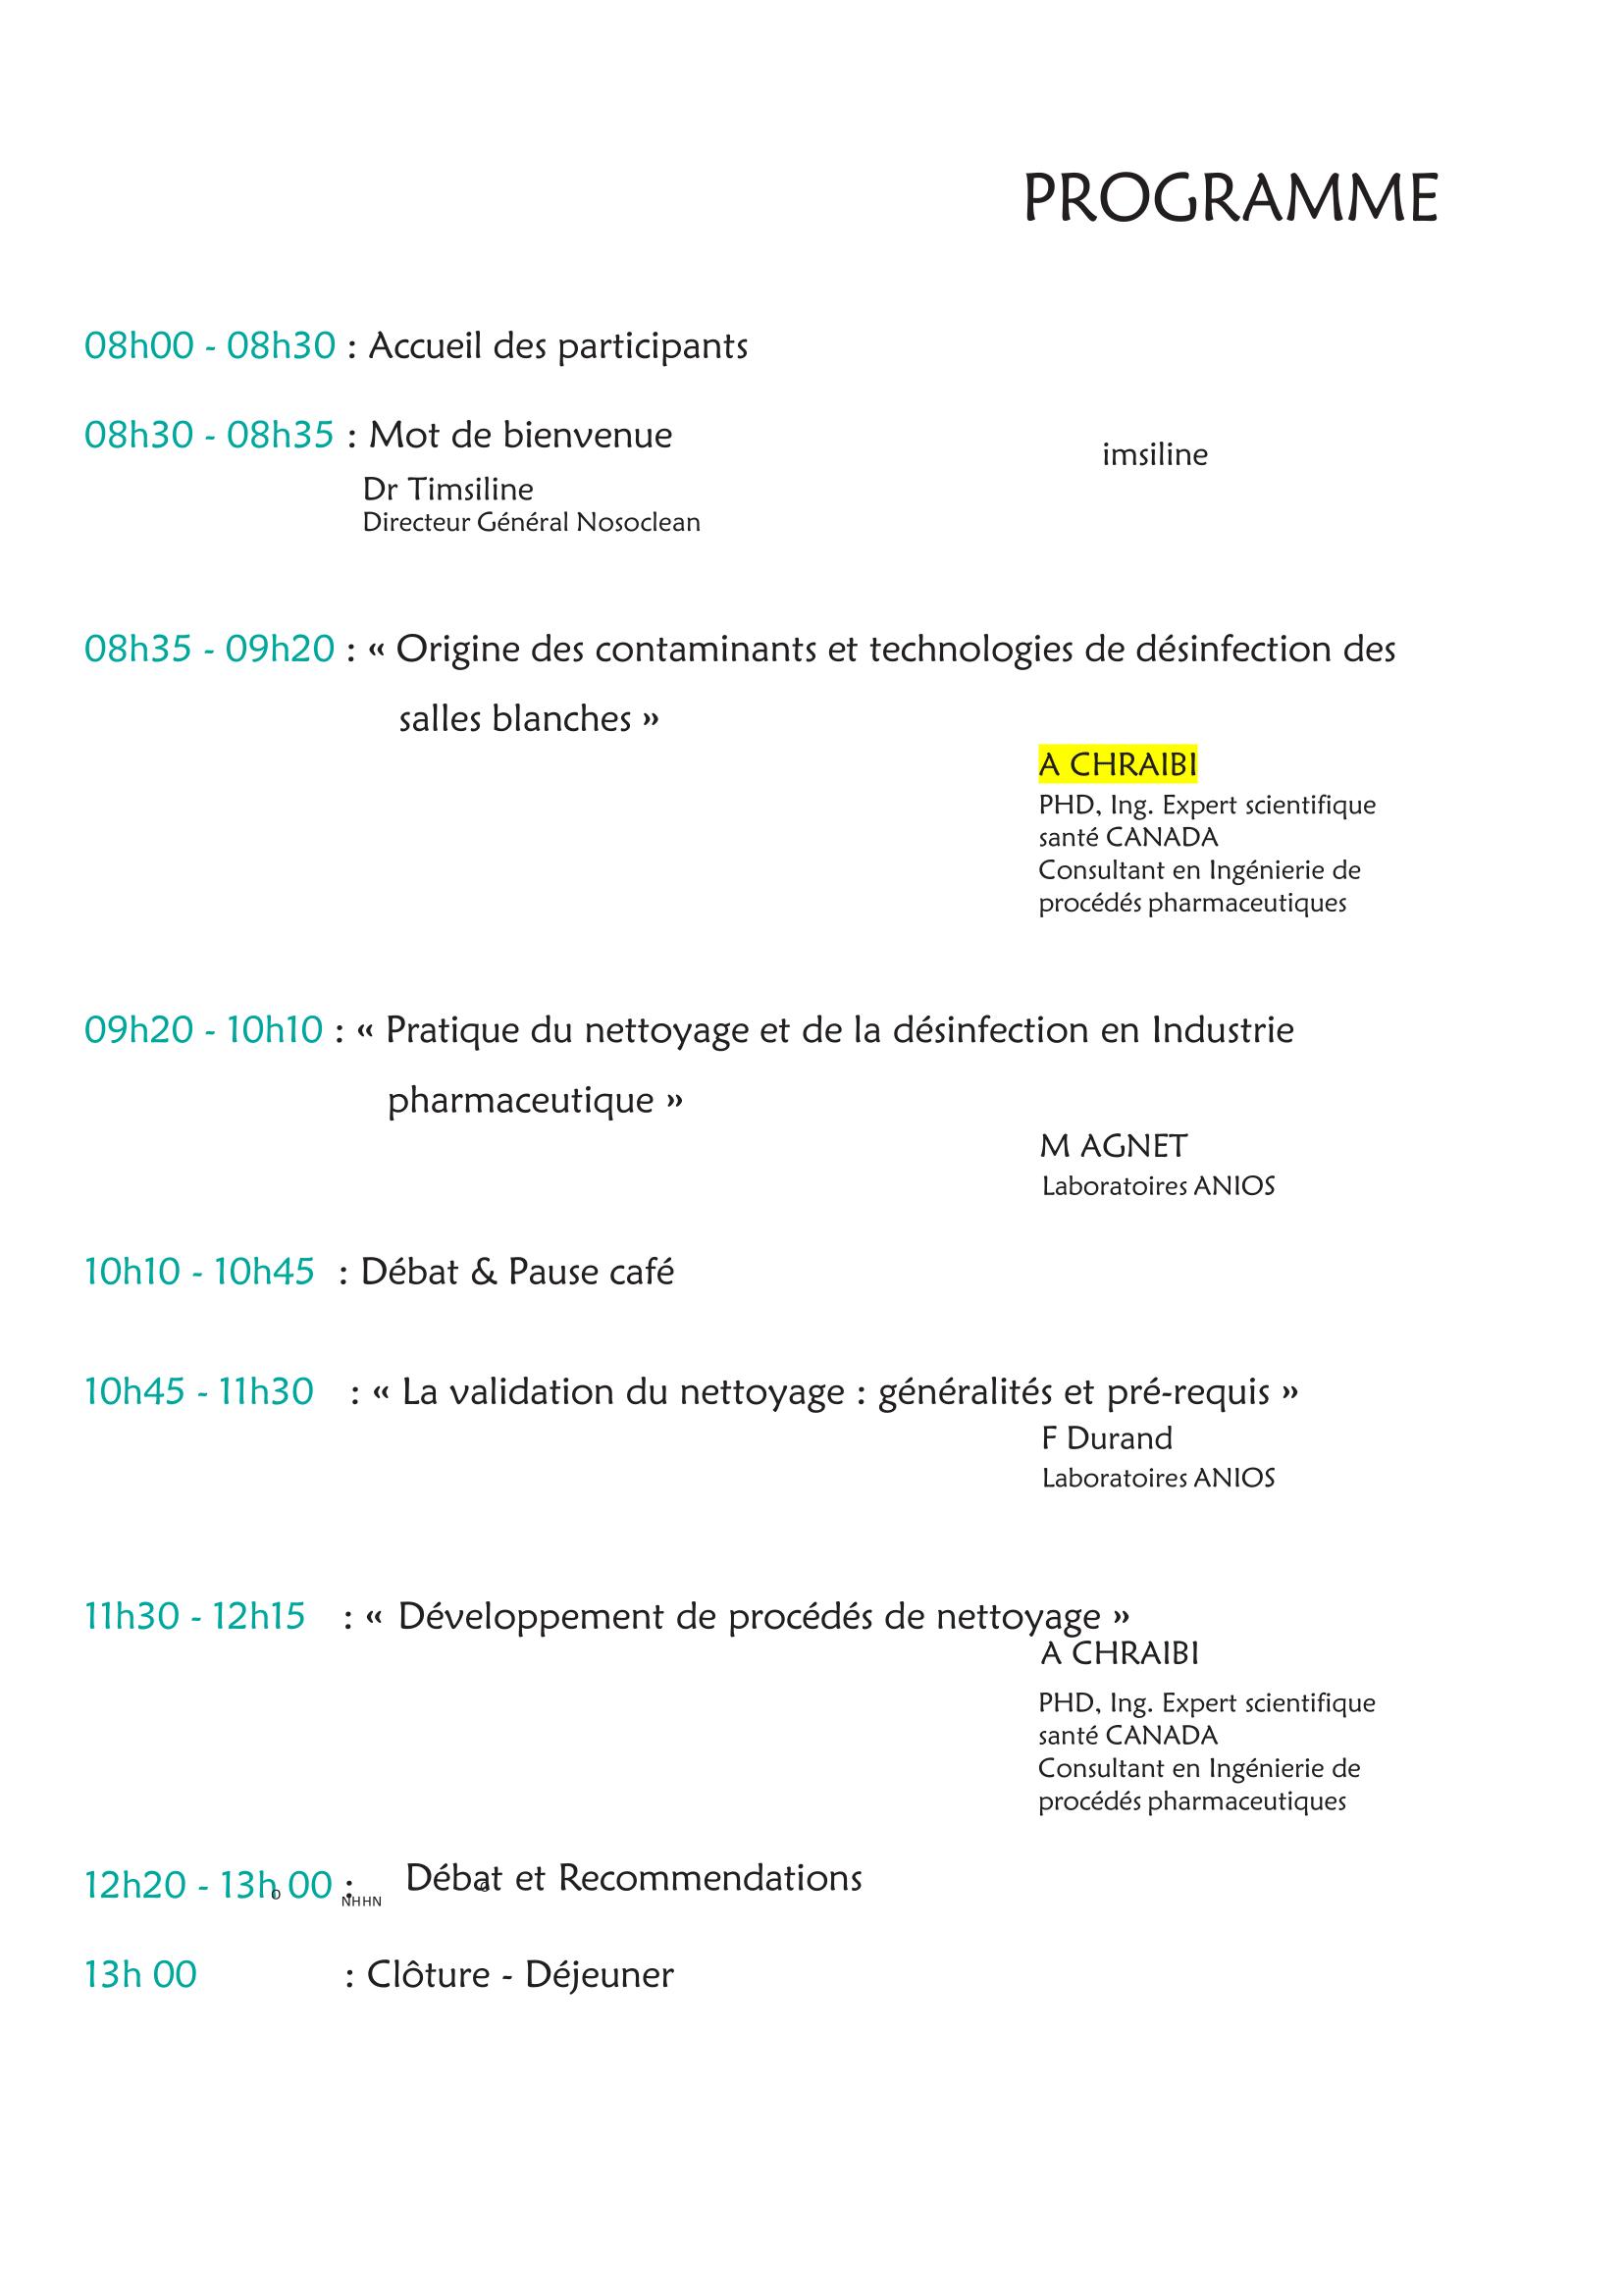 https://pbe-expert.com/wp-content/uploads/2018/04/PBE-Programme-NOSCLEAN-Pharma-12-Nov-2013-1.png